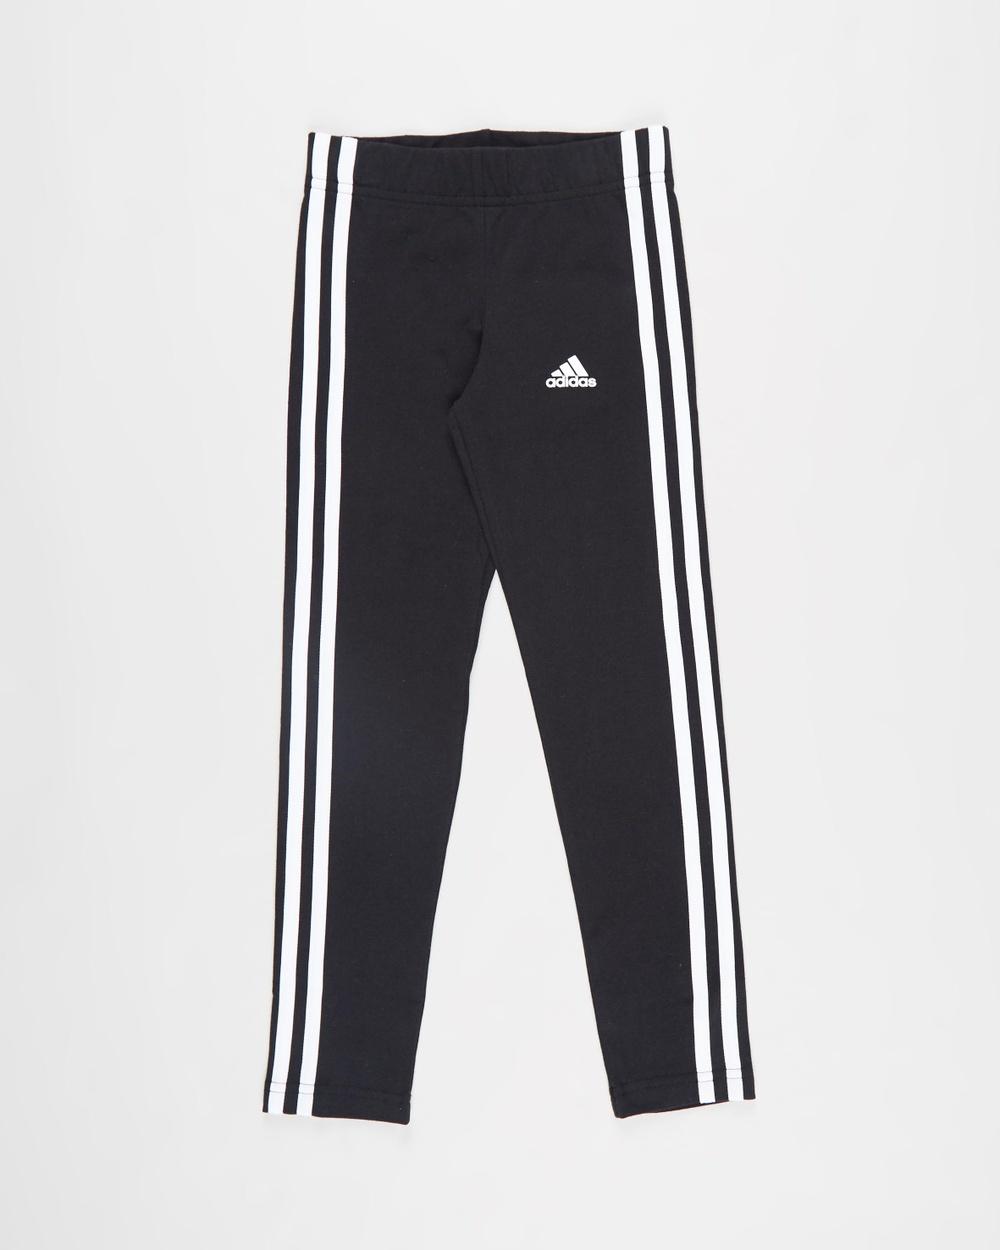 adidas Performance Essentials 3 Stripes Leggings Kids Teens Pants Black & White 3-Stripes Kids-Teens